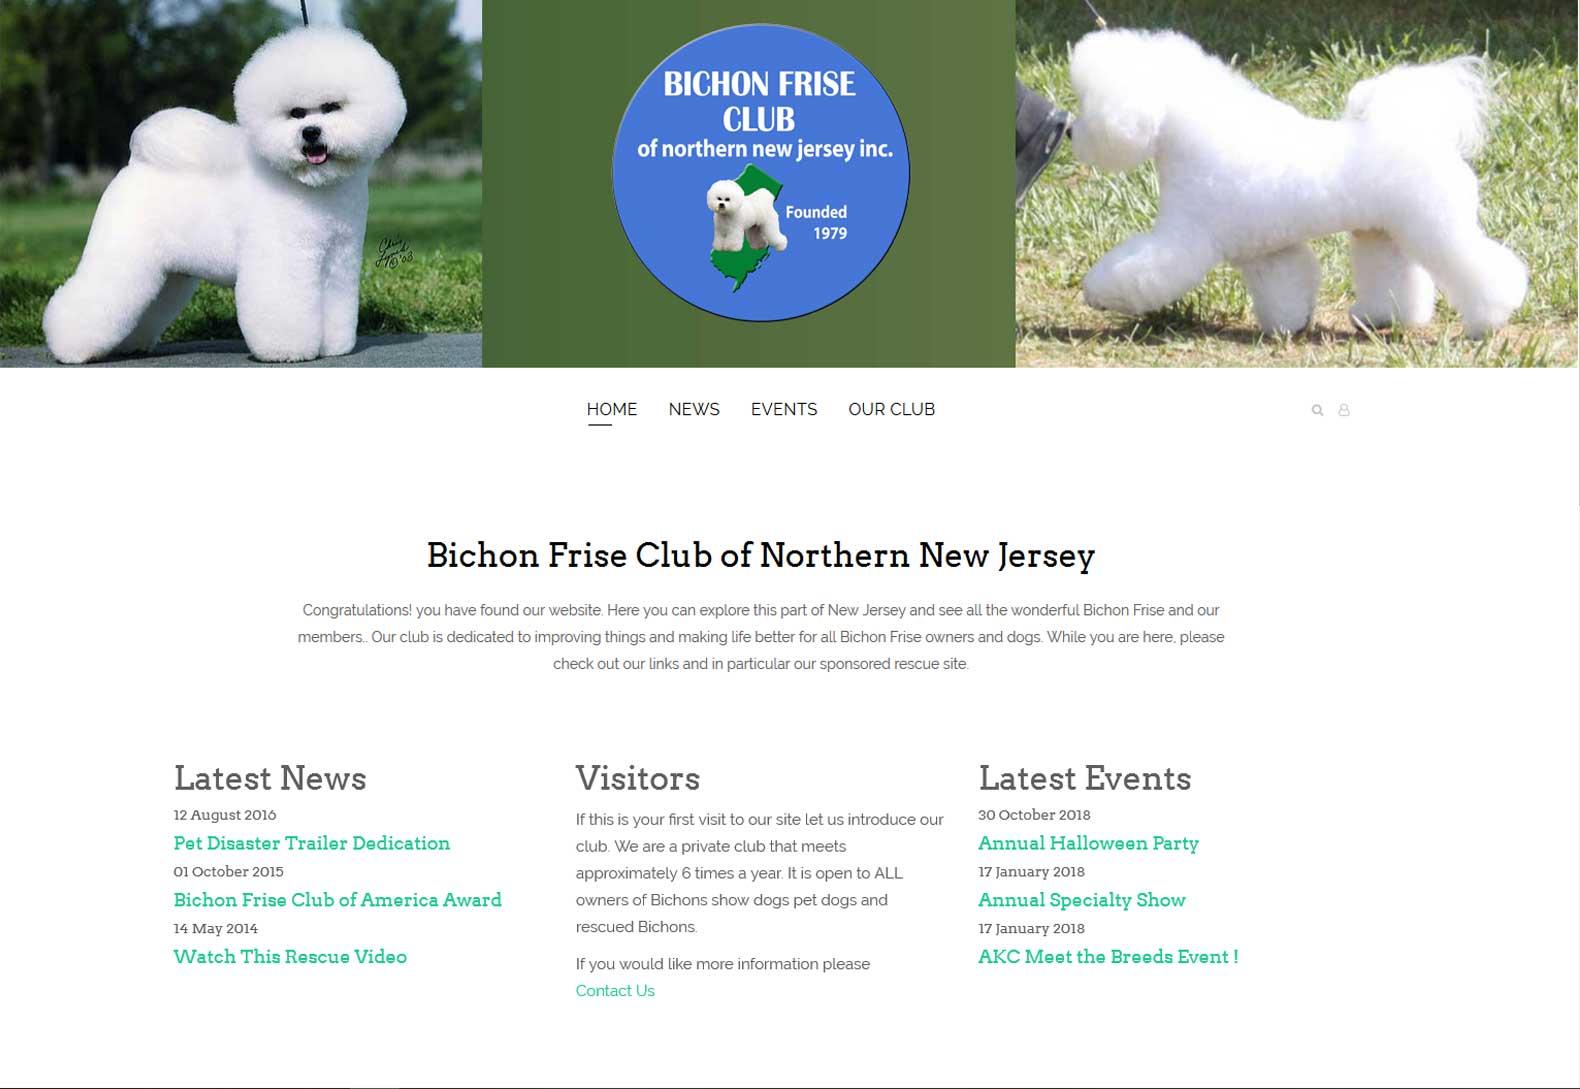 Bichon Frise Club of Northern New Jersey